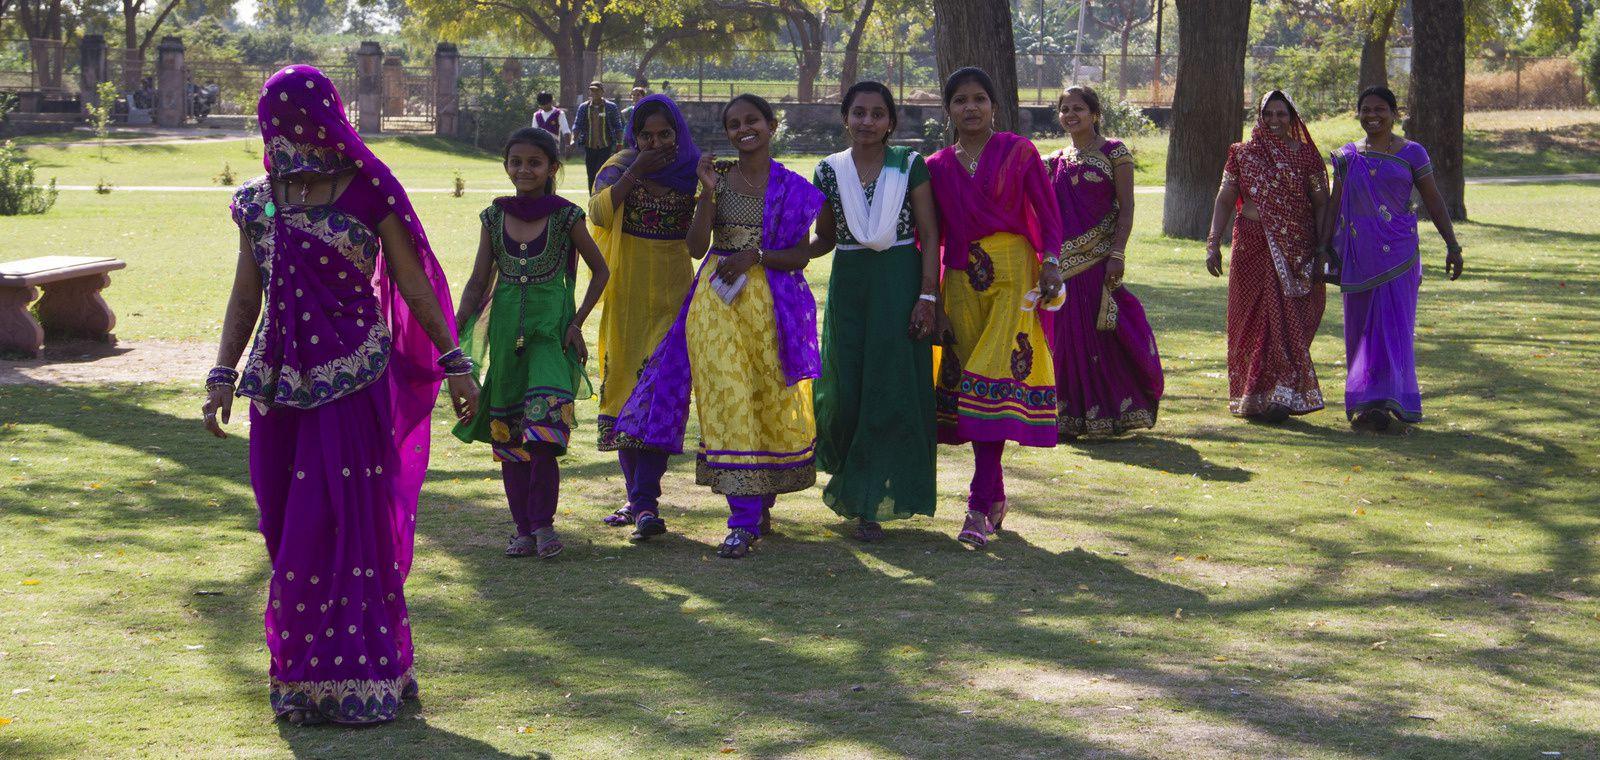 Personnes prises en photographie au Rani Ki Vav